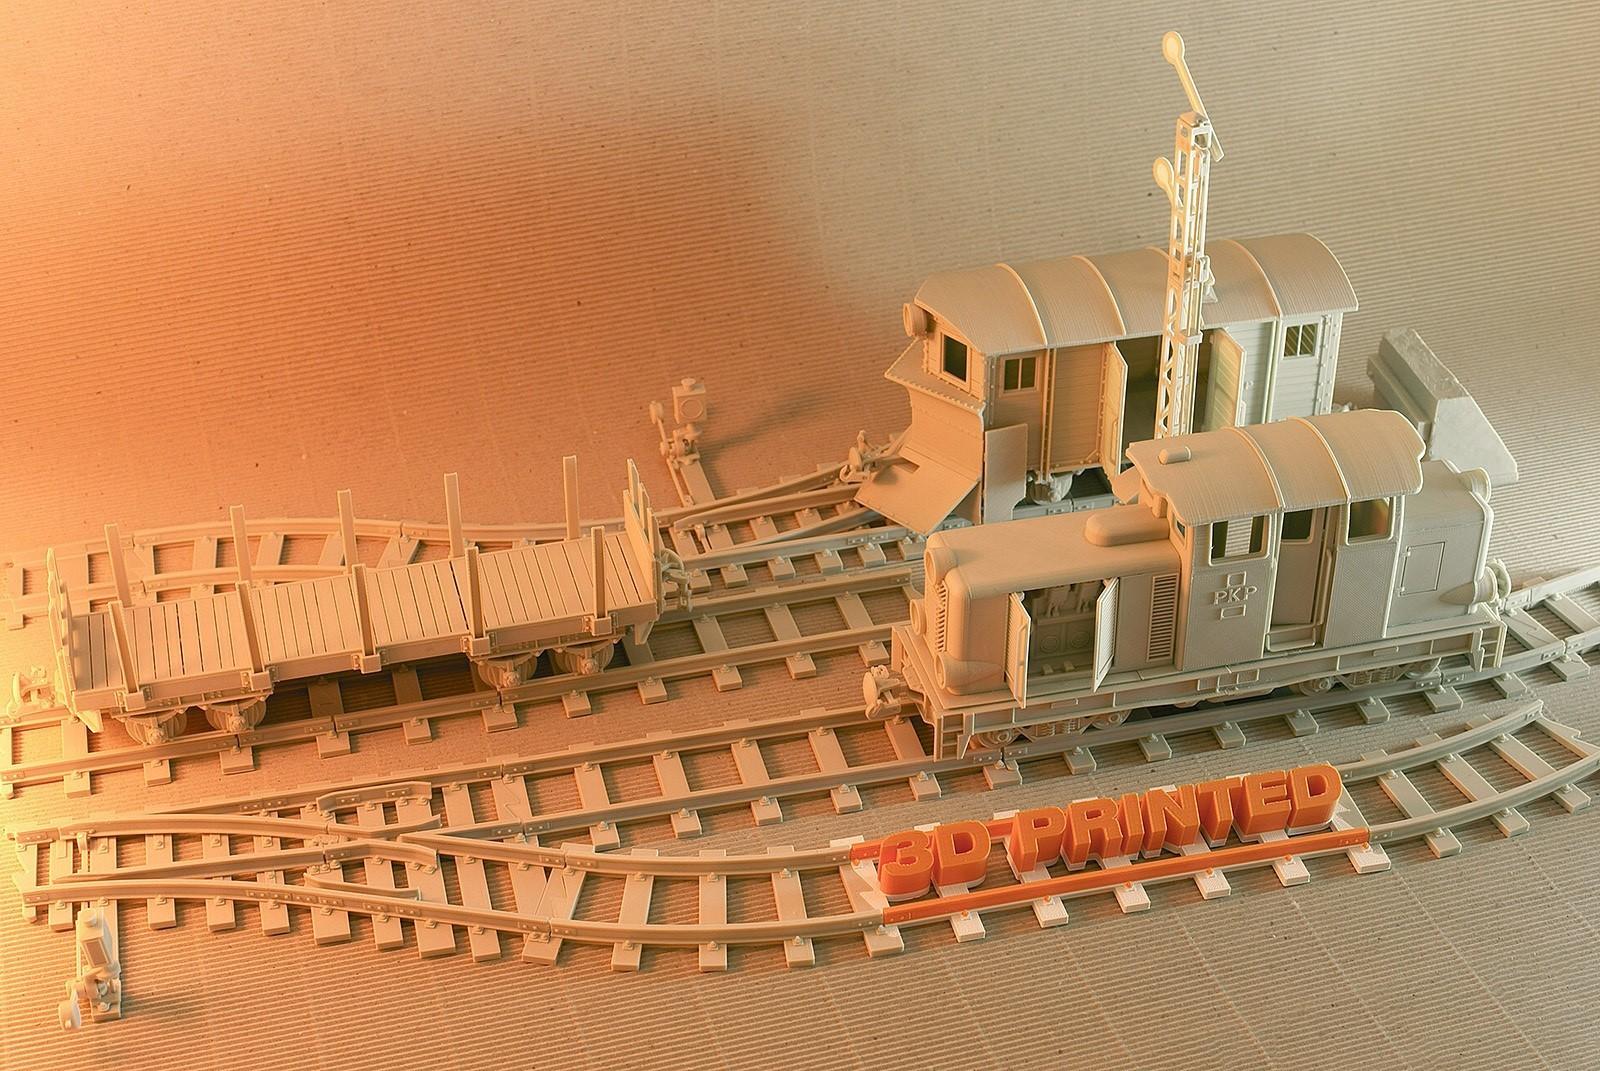 DSC07562L.jpg Download STL file Diesel-01 locomotive model that fits popular tracks • 3D print model, euroreprap_eu